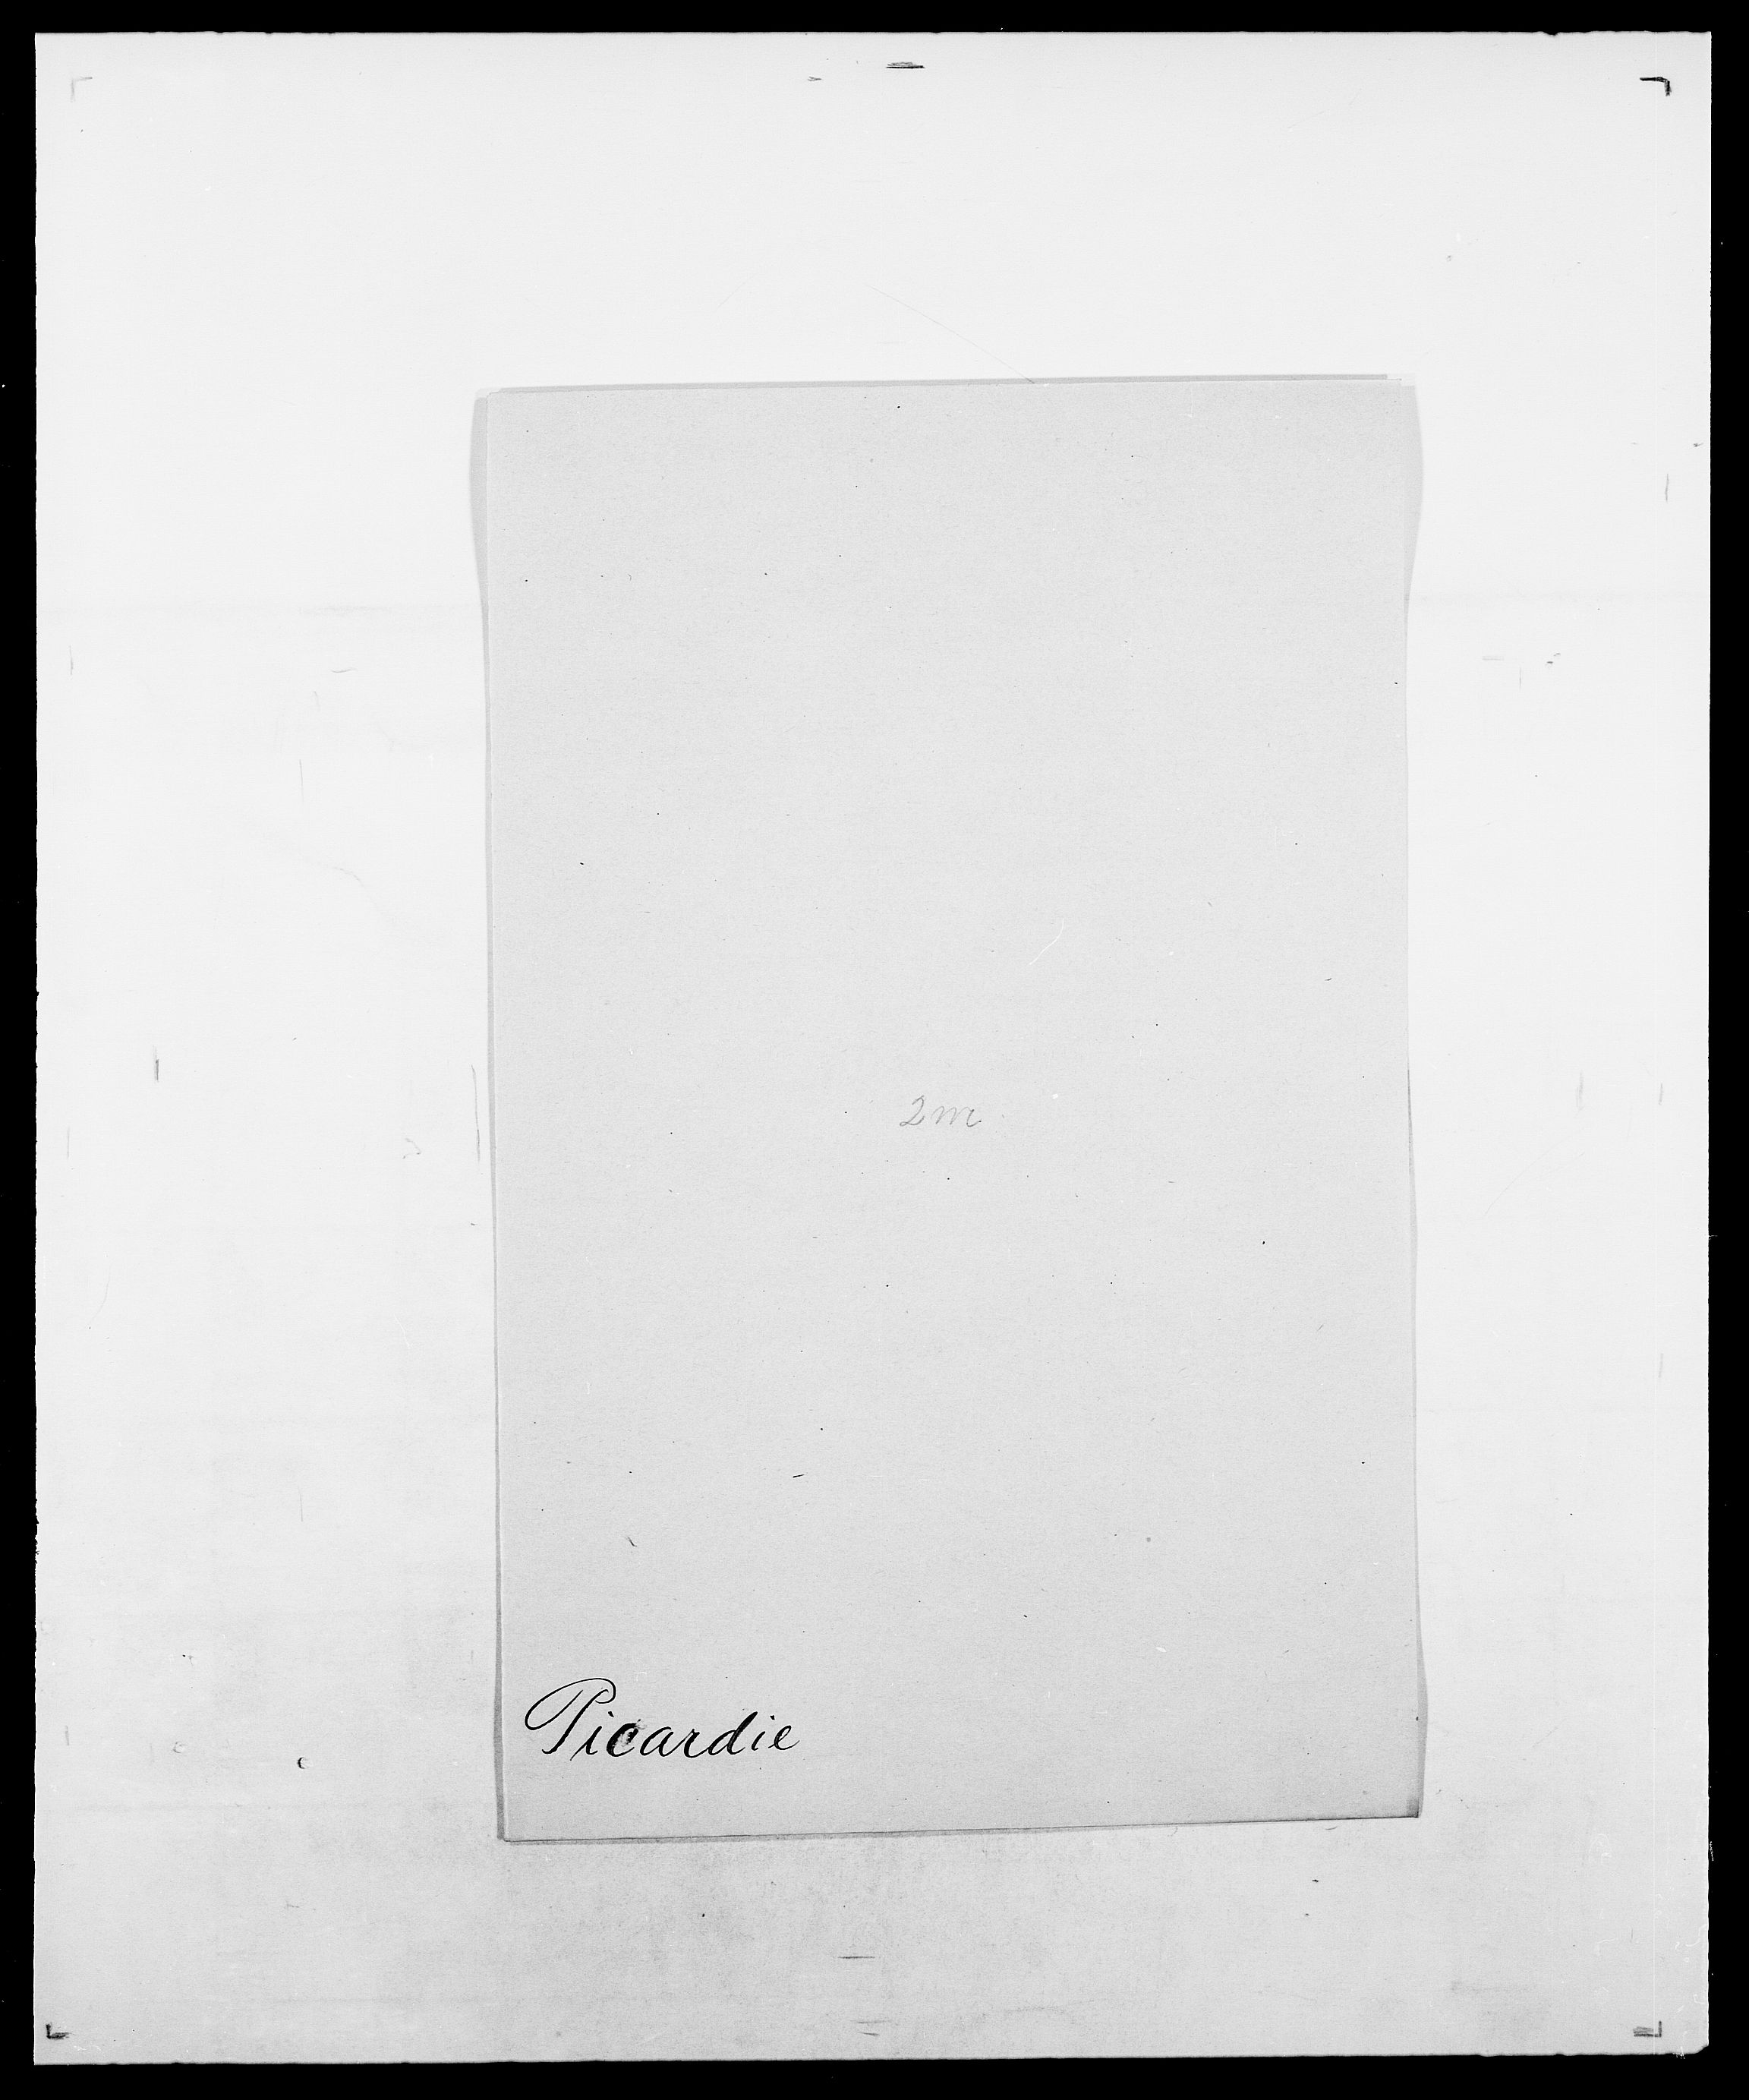 SAO, Delgobe, Charles Antoine - samling, D/Da/L0030: Paars - Pittelkov, s. 523